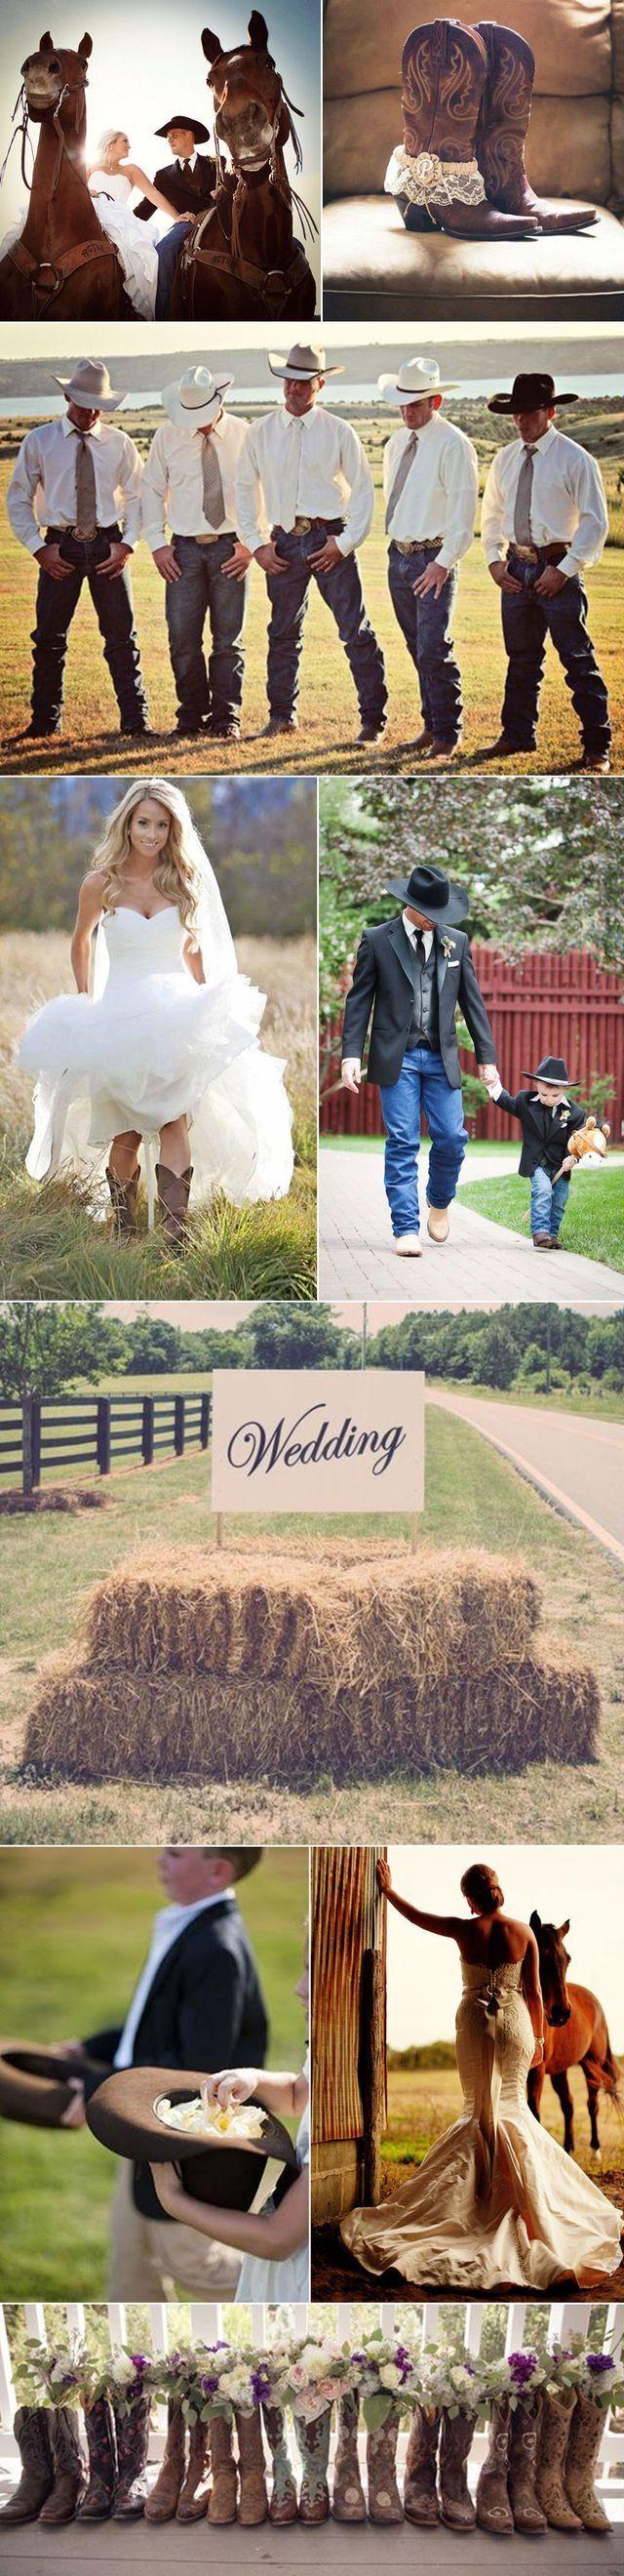 Cowboy Wedding Troue Pinterest Cowboys Wedding And Weddings